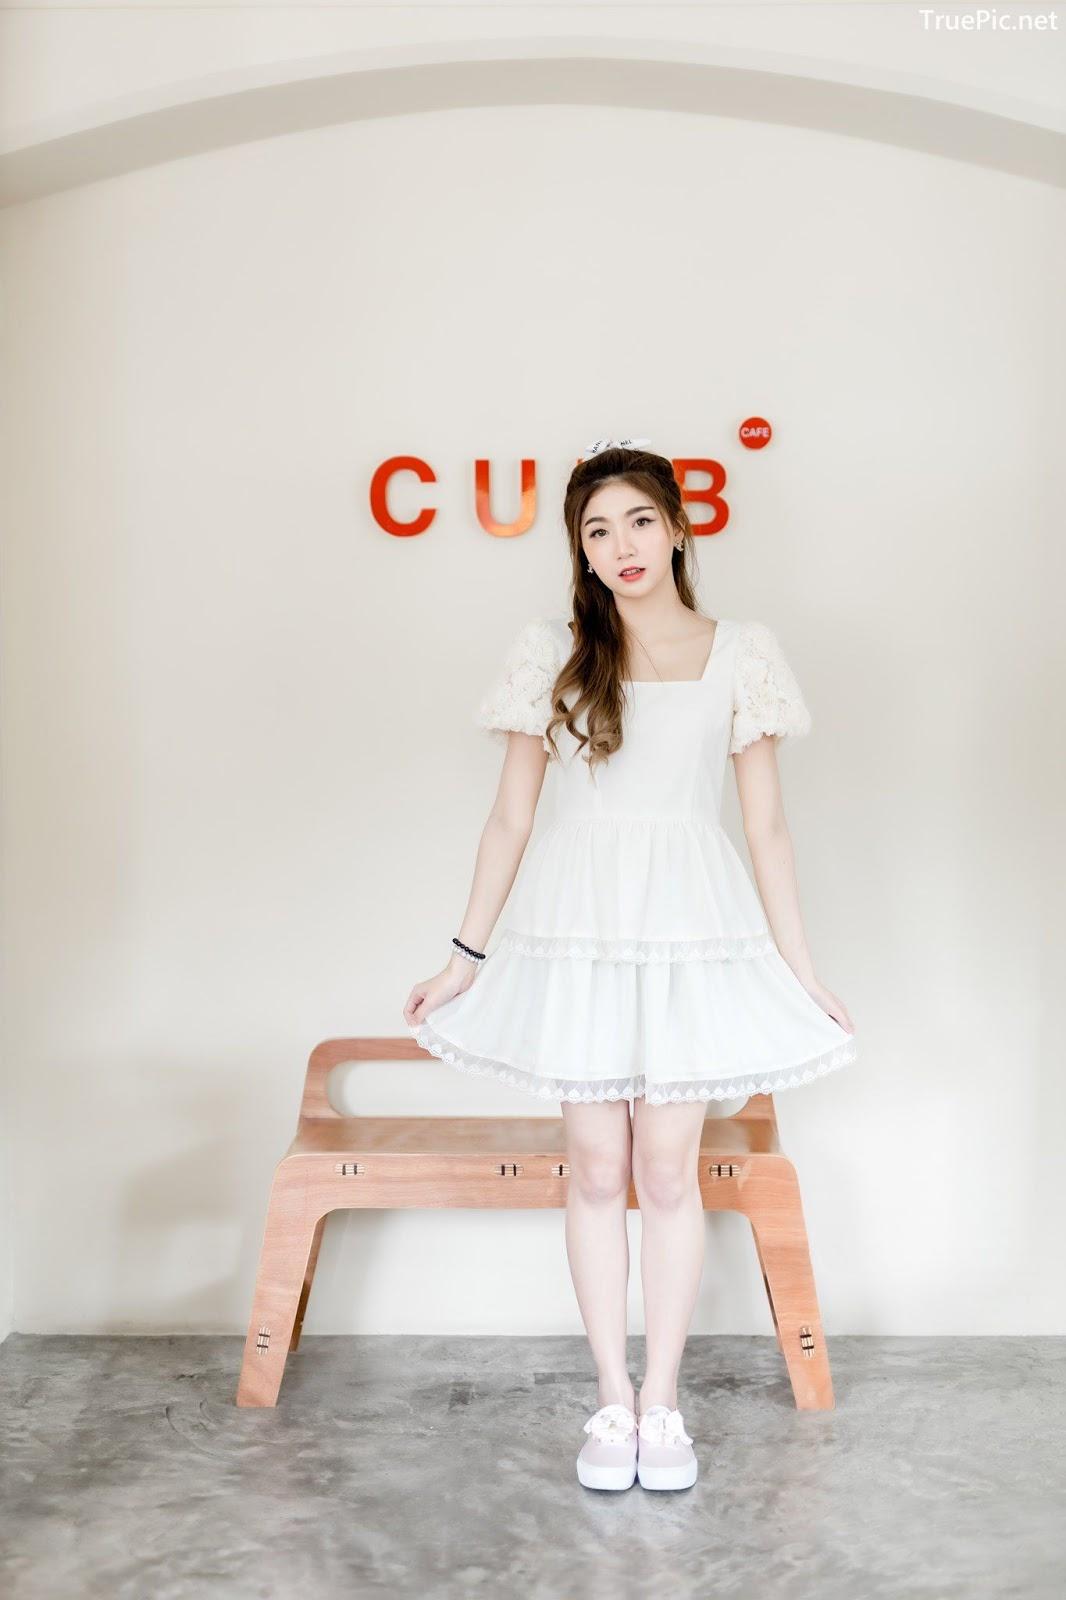 Image Thailand Model - Sasi Ngiunwan - Barbie Doll Smile - TruePic.net - Picture-7